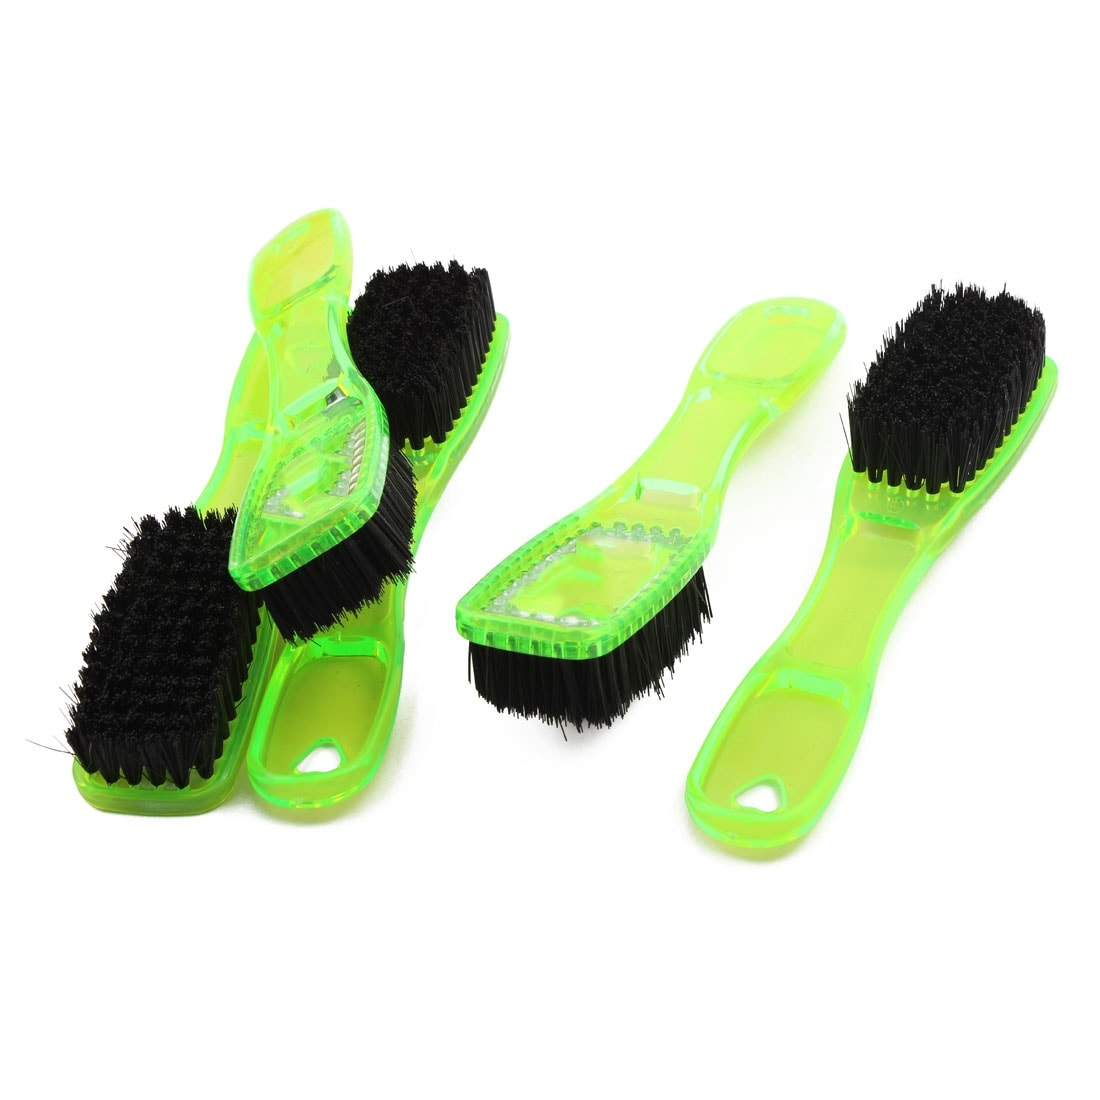 Bathroom Clothes Shoes Floor Scrub Washing Washing Brush 5 Pcs Black Green Overstock 17619665